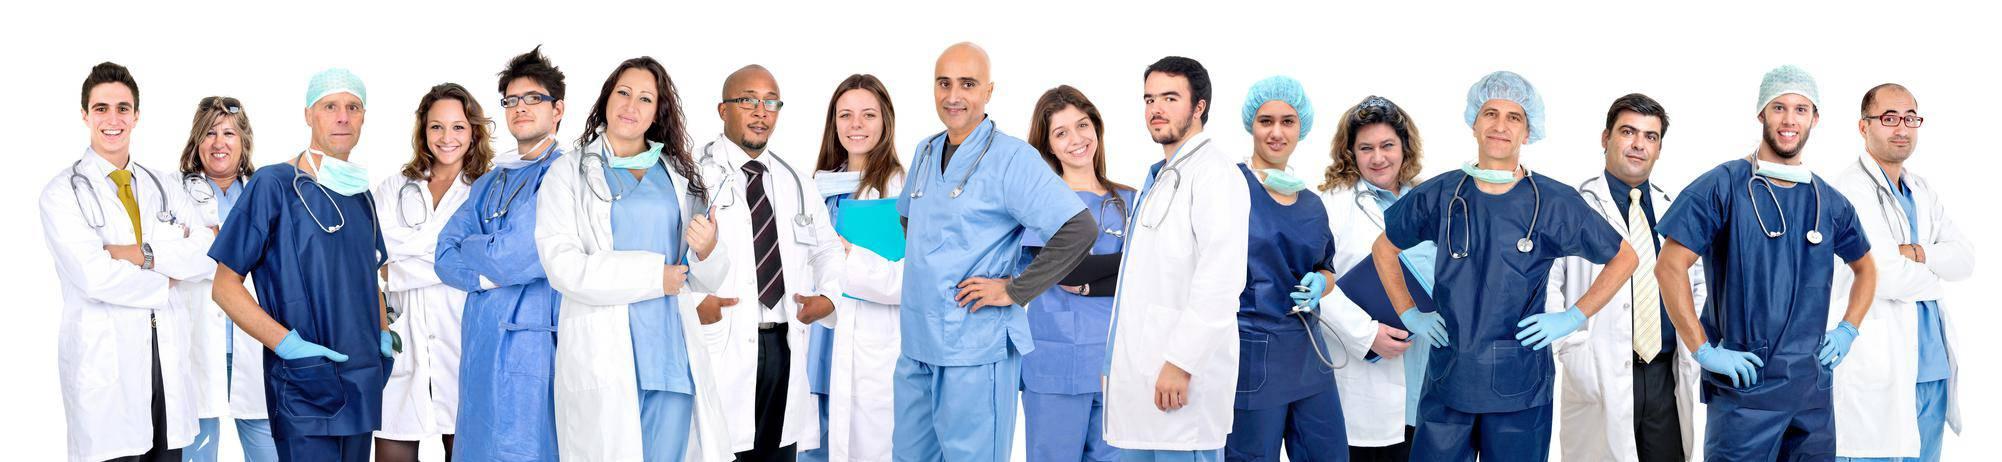 Fachkraft für Pflegeassistenz (m/w/d)